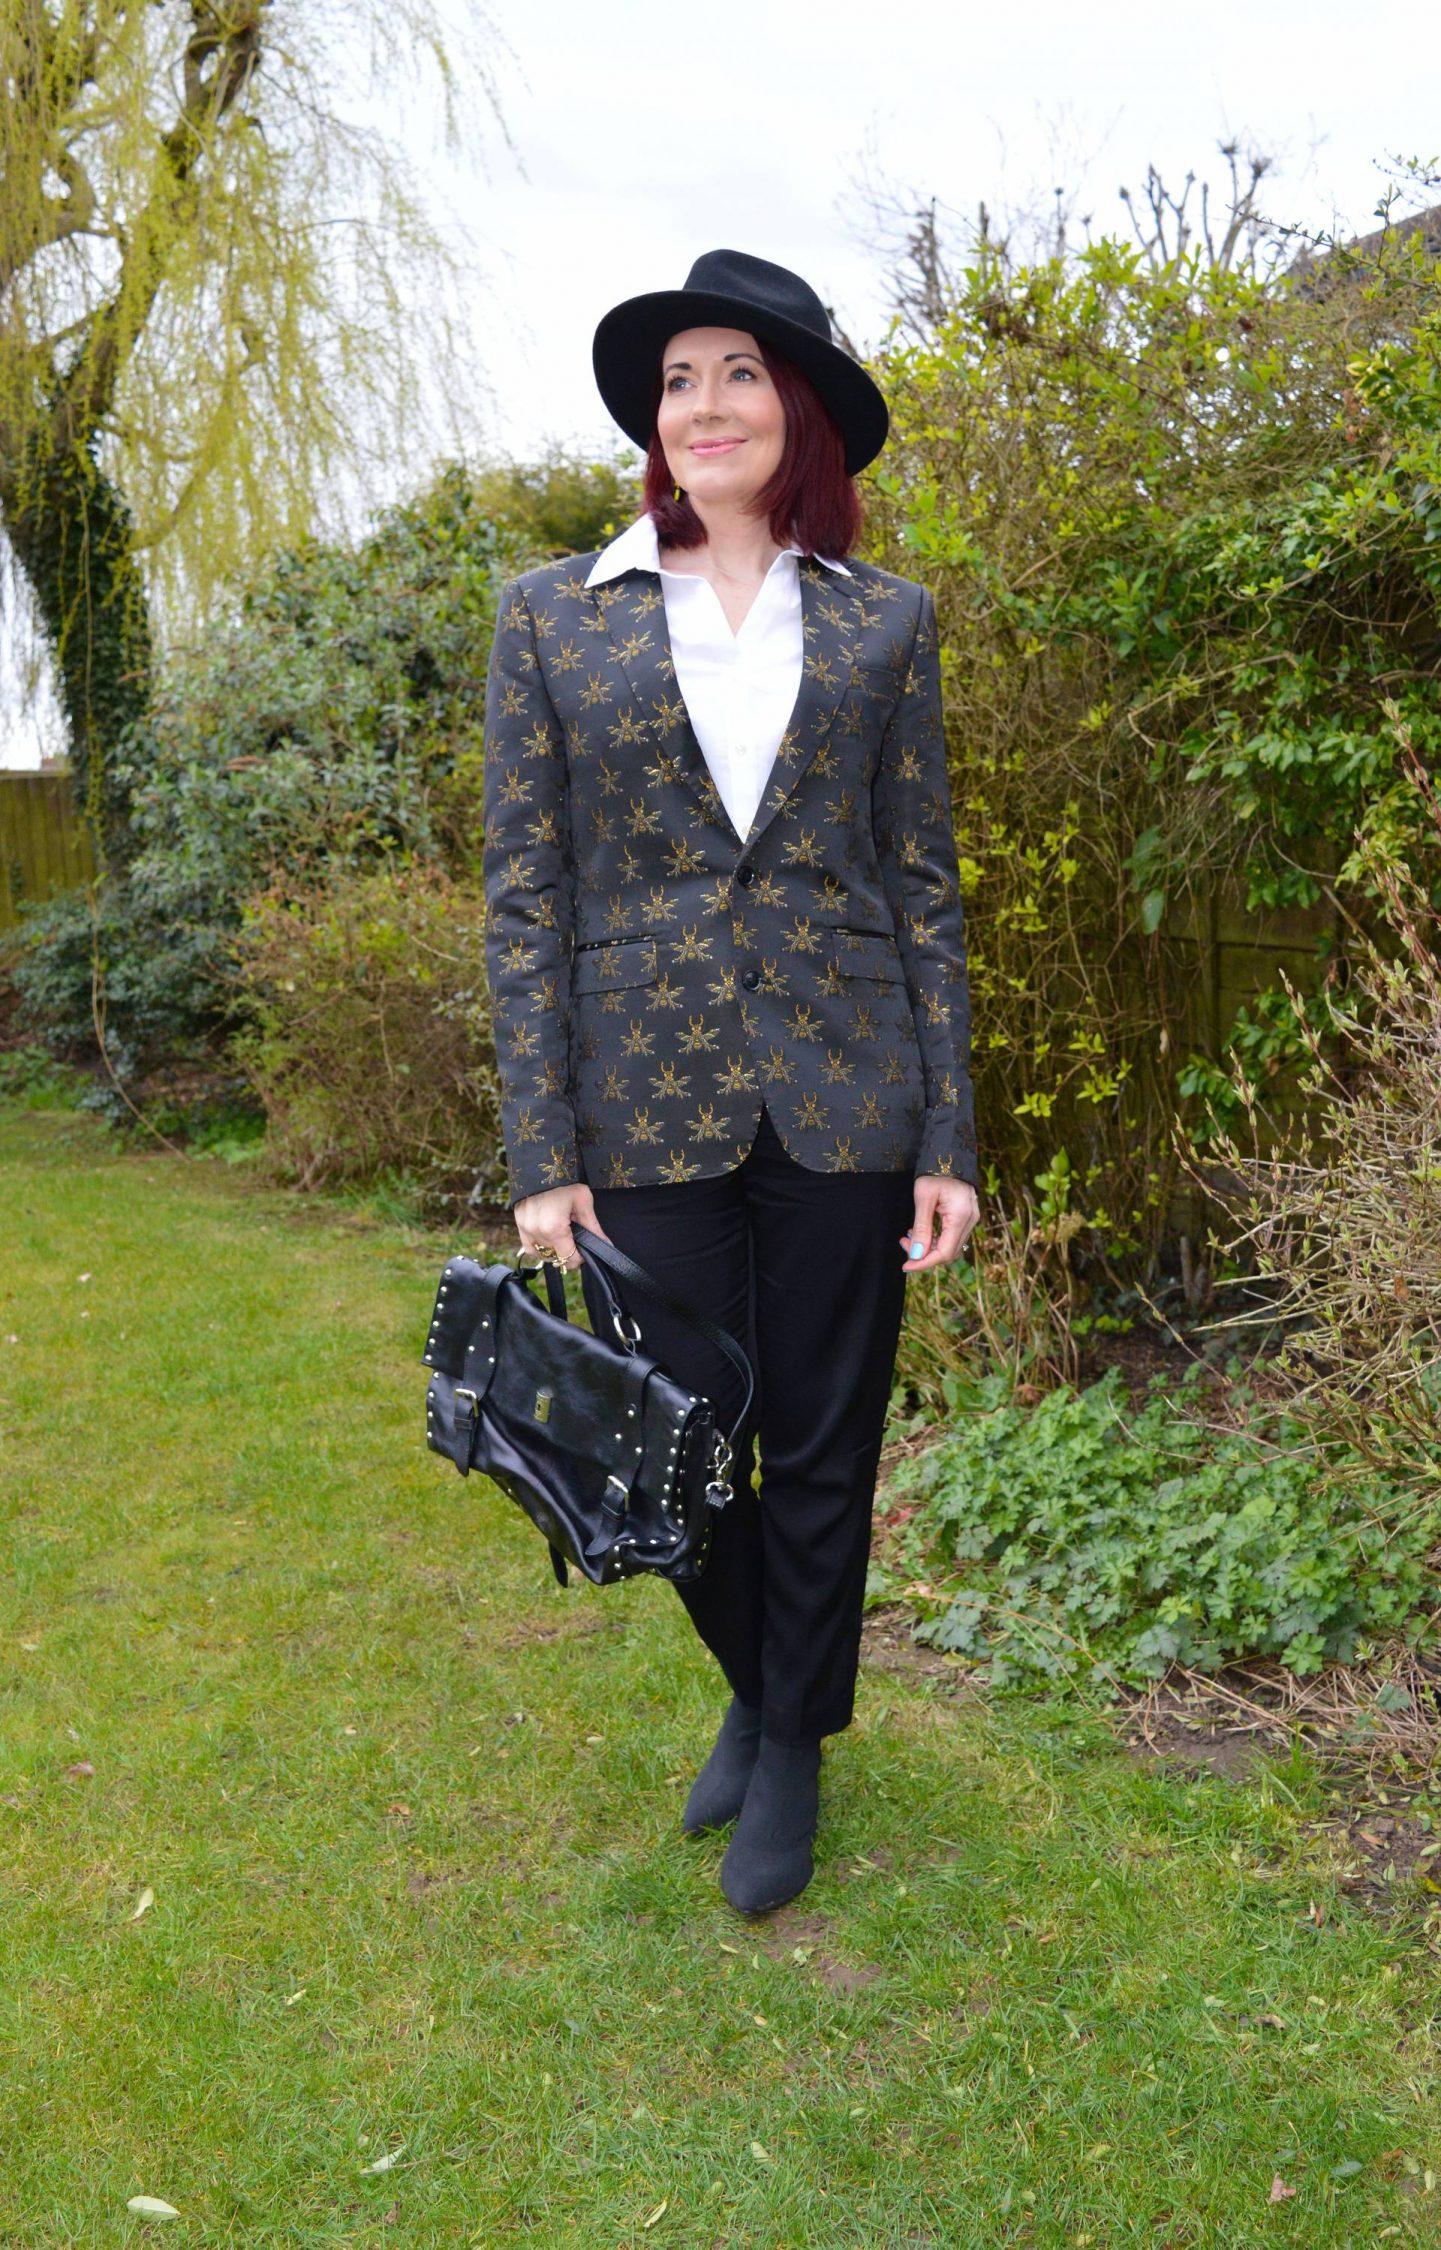 Borrowed From the Boys - March Style Not Age, Devil's Advocate bee embroidered blazer, Tibi tuxedo trousers, Zara black fedora, Modalu black studded satchel